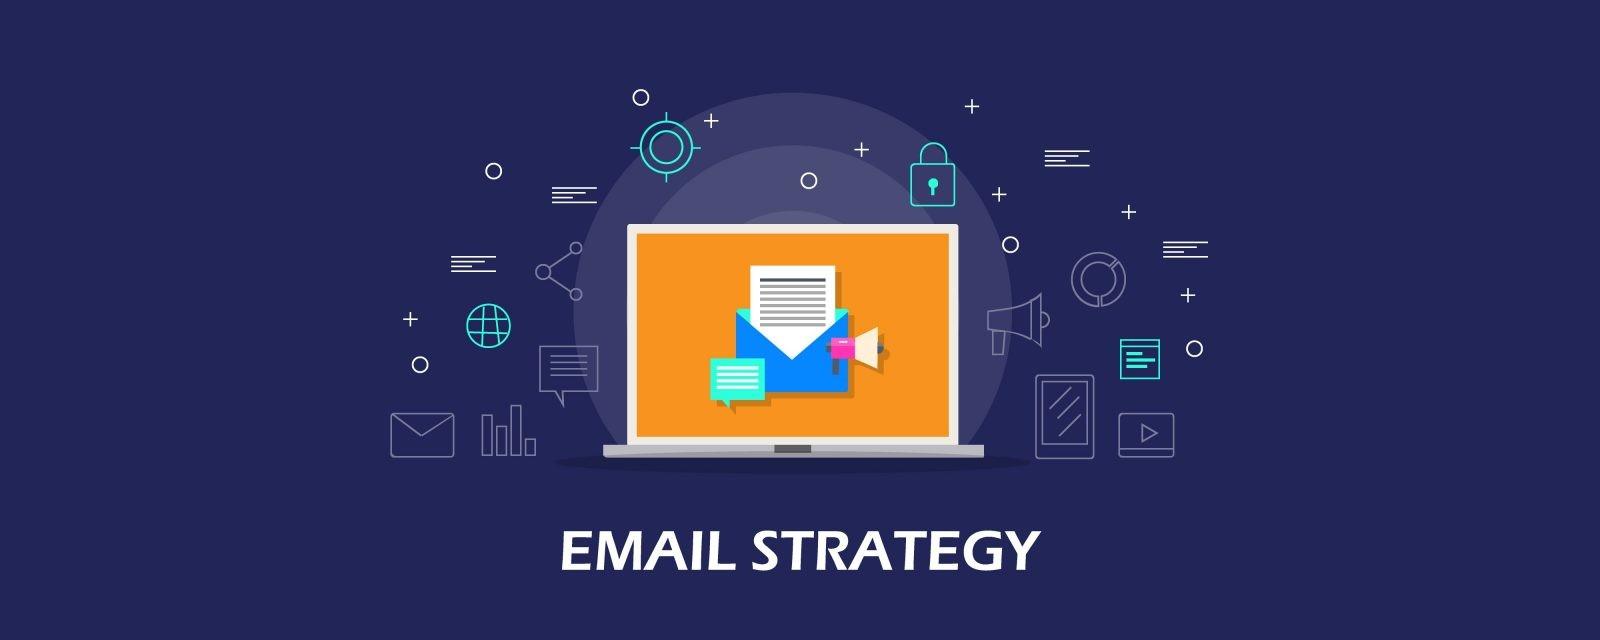 5 Innovative Email Marketing Tips